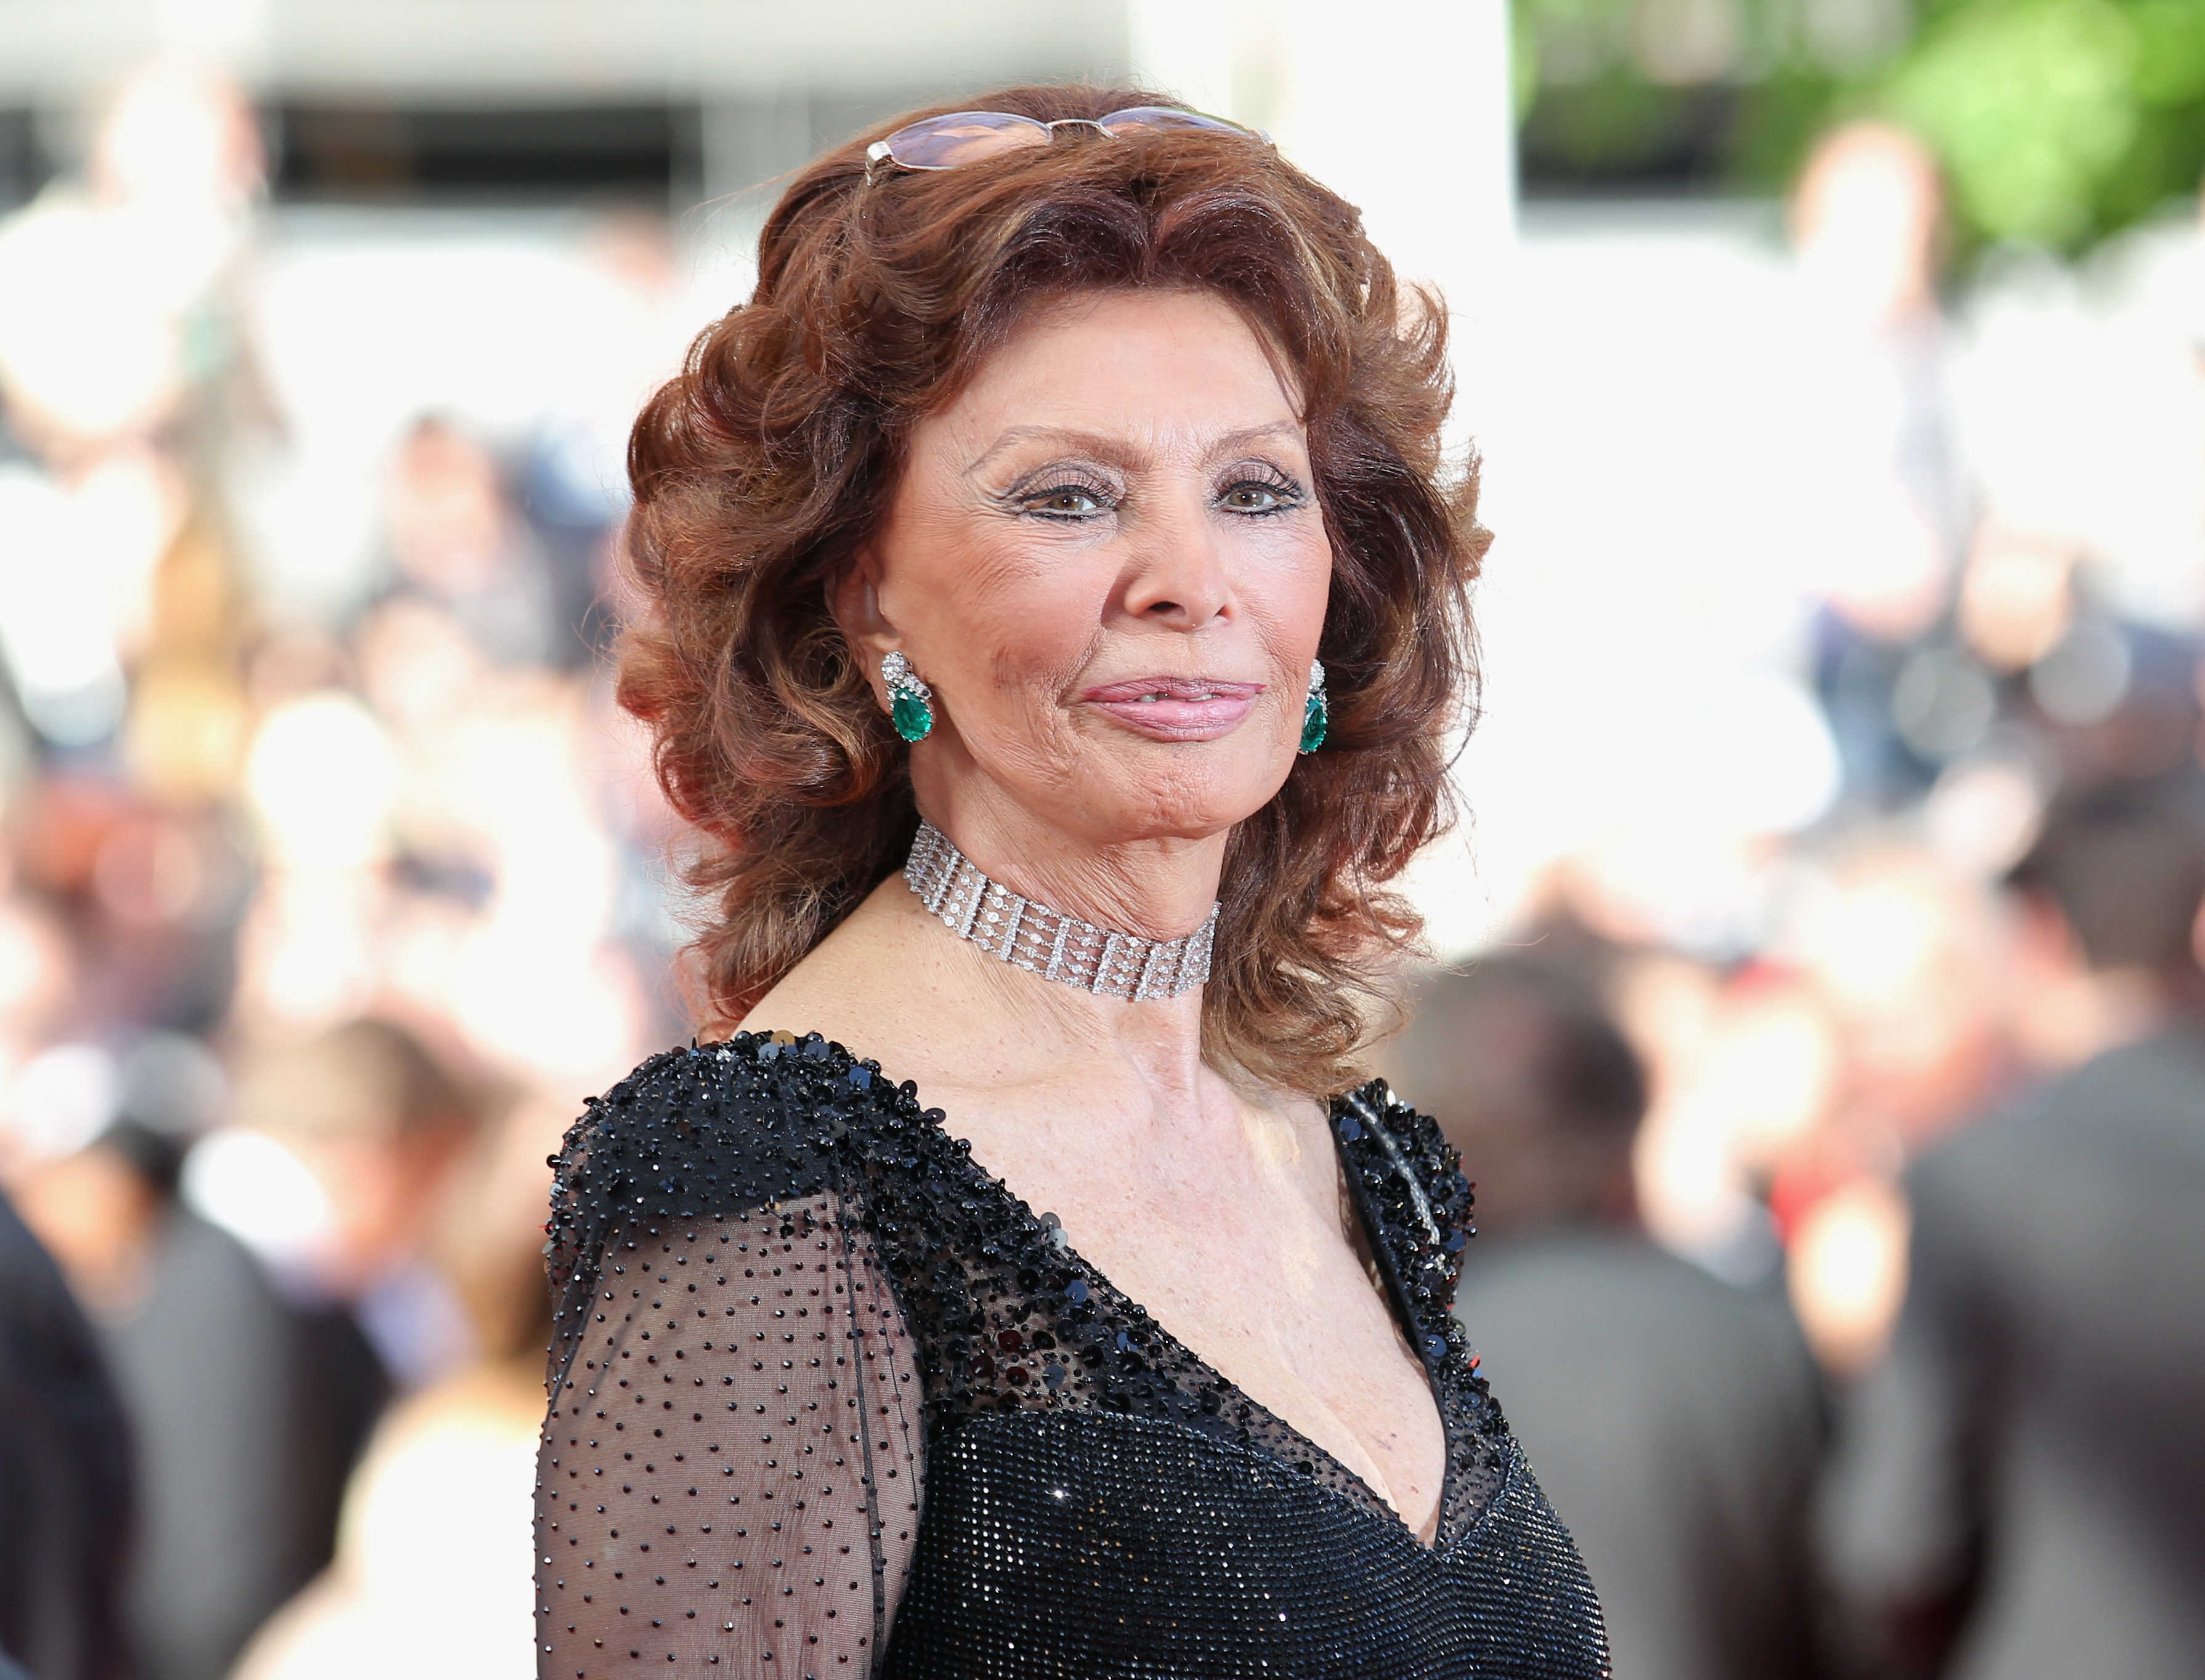 Stumptownblogger Sophia Loren Is 84 Today